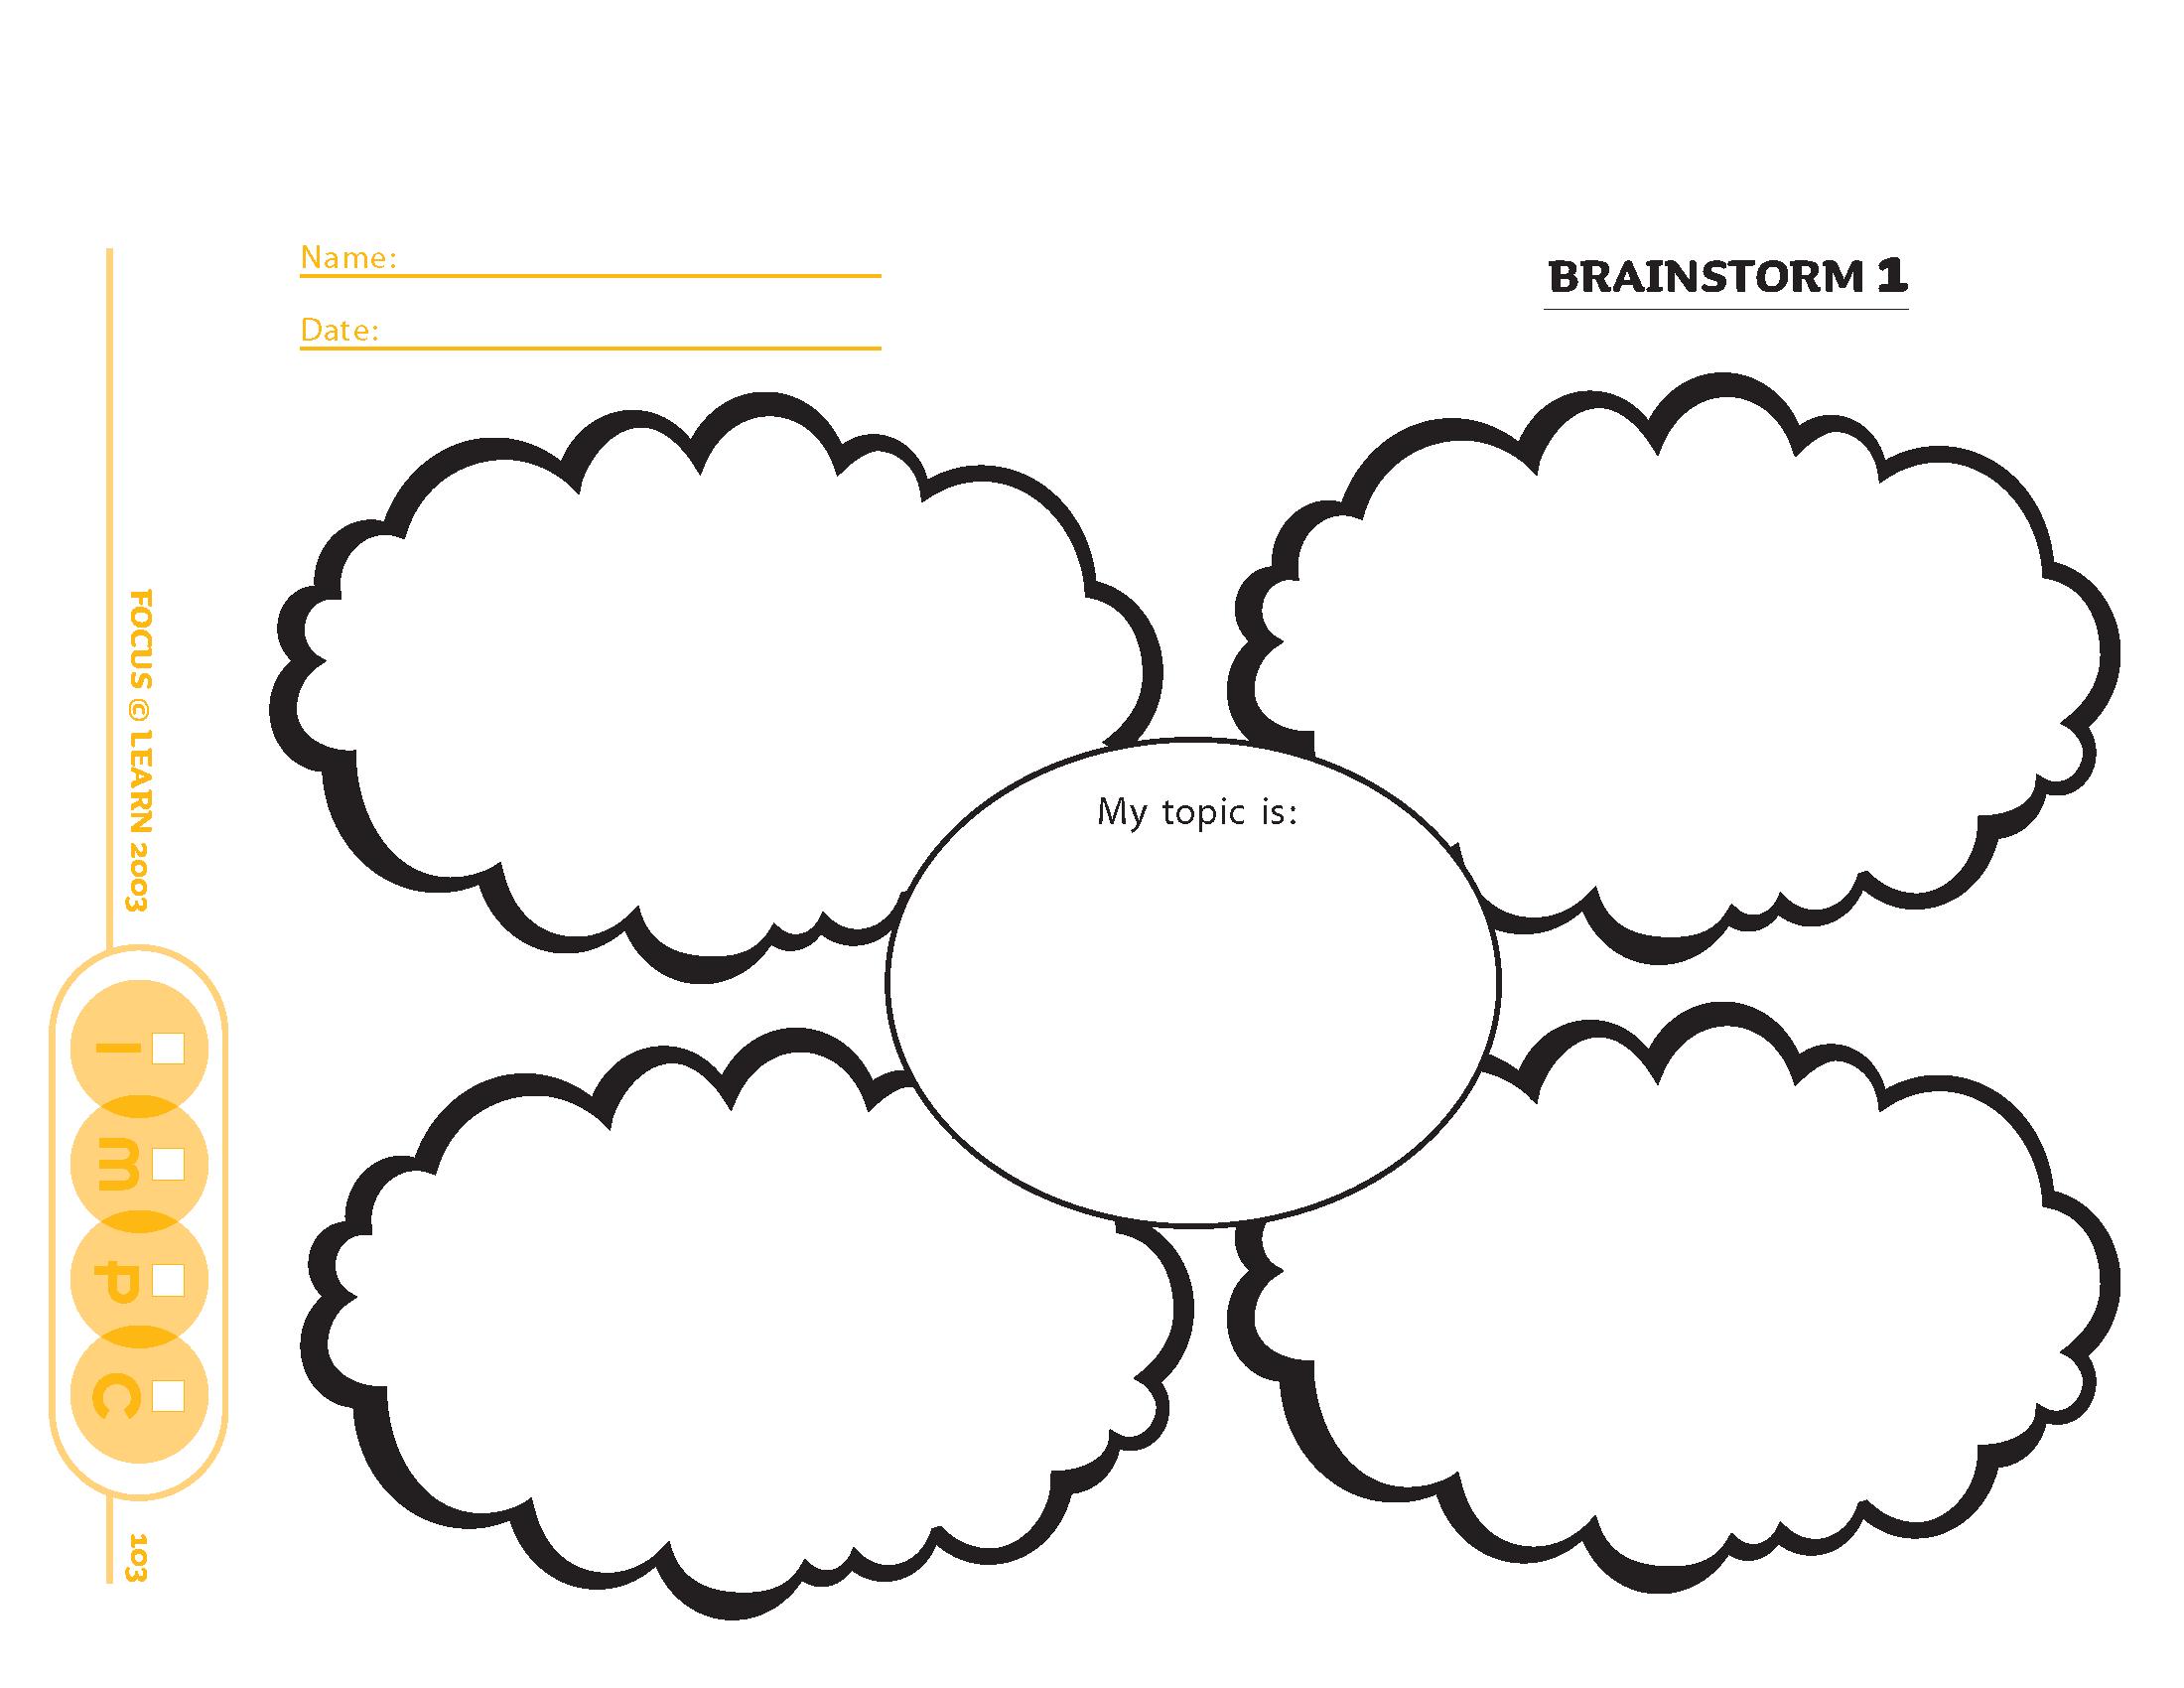 Brainstorm Tool 1